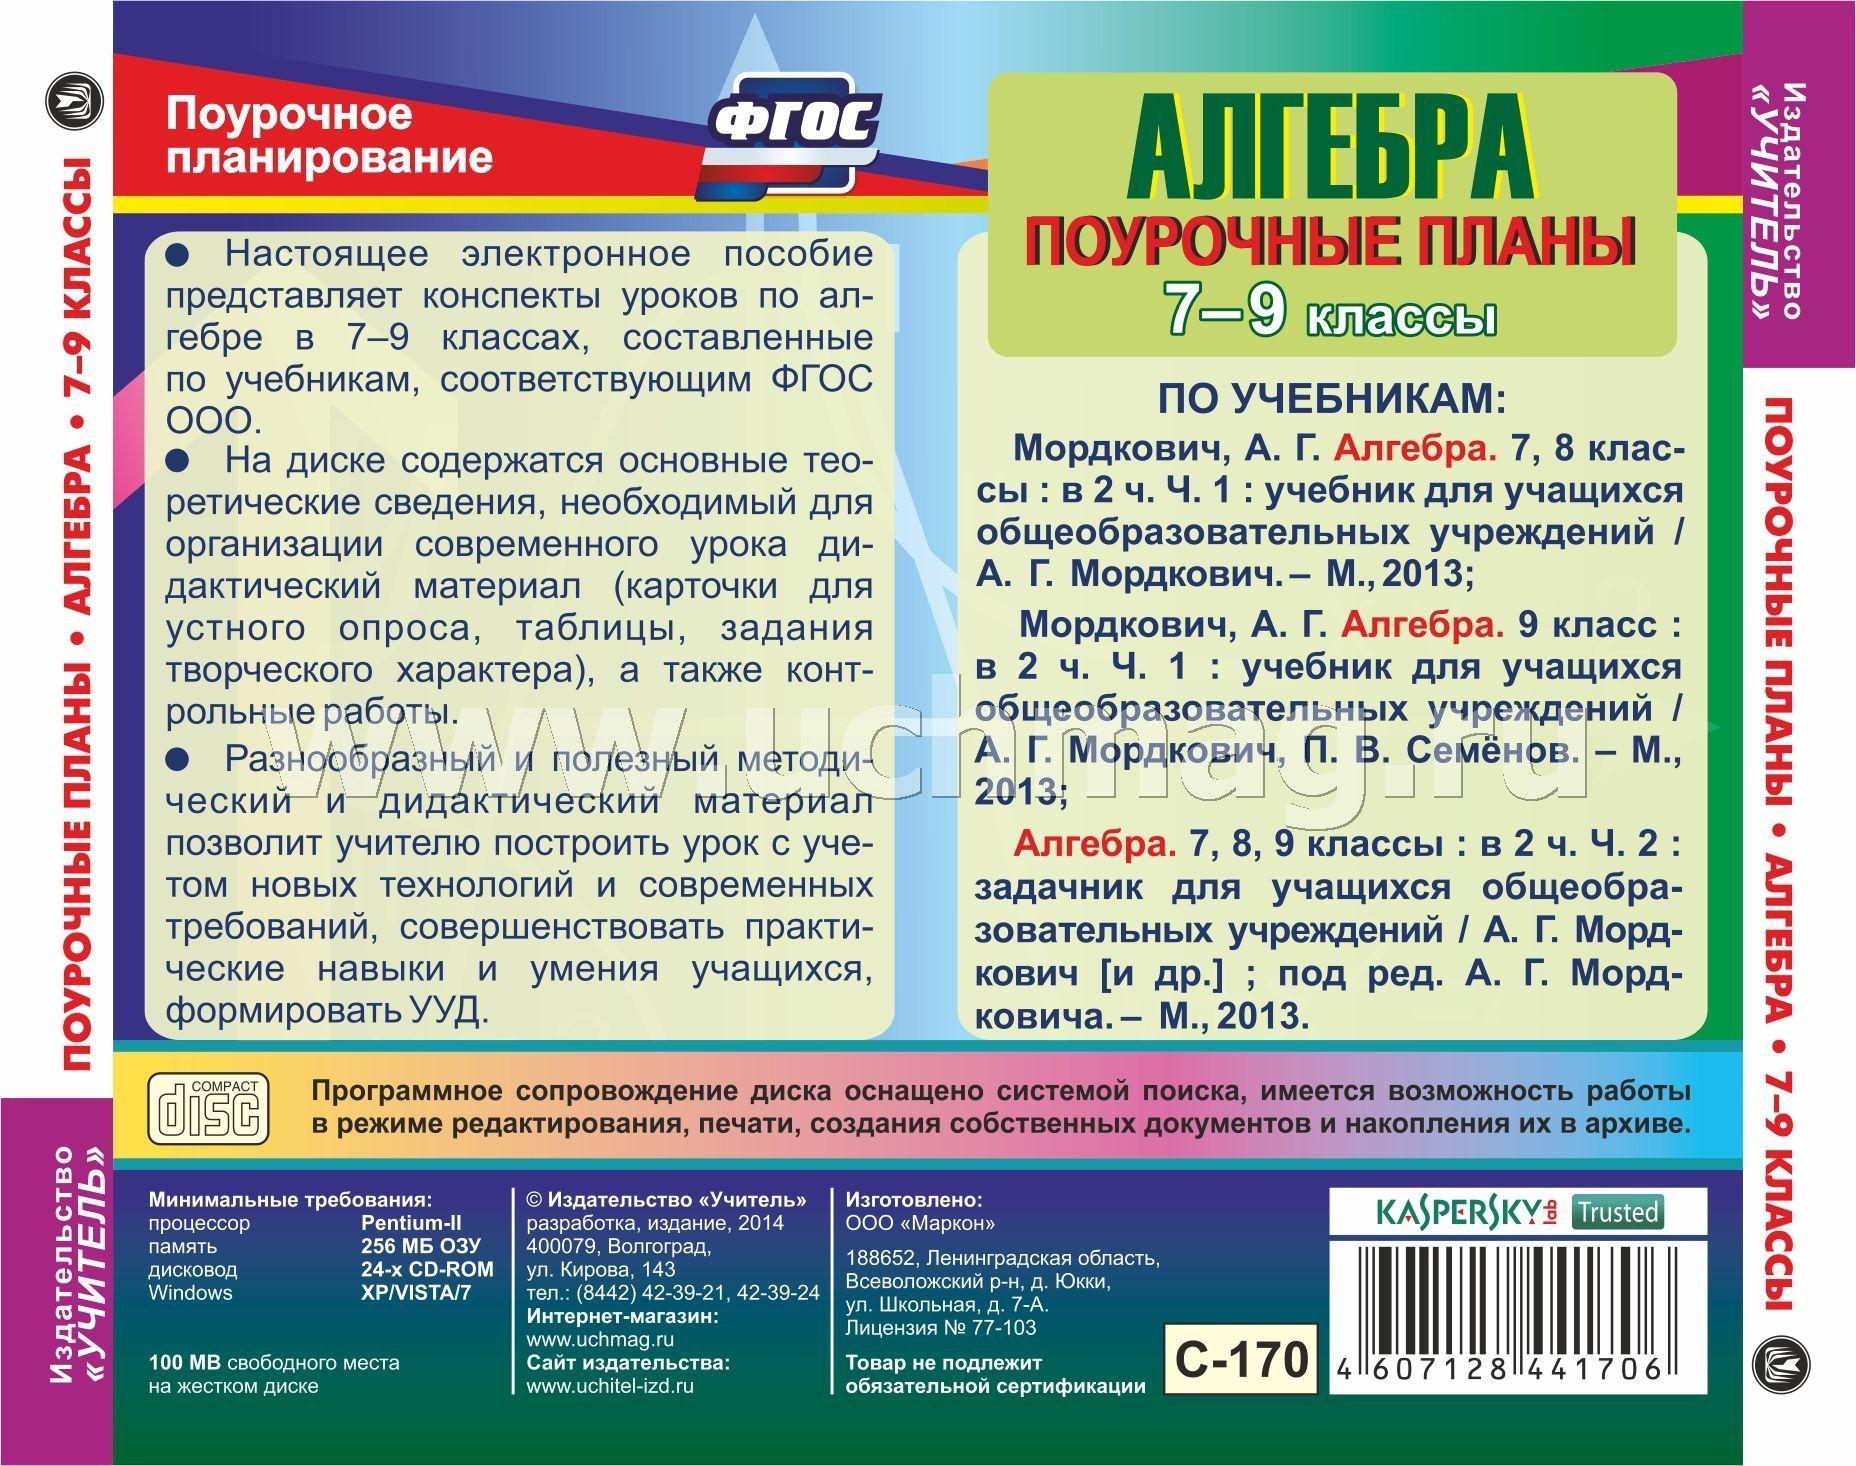 Гдз по химии 7 класс шиманович сечко хвалюк красицкий тихонов